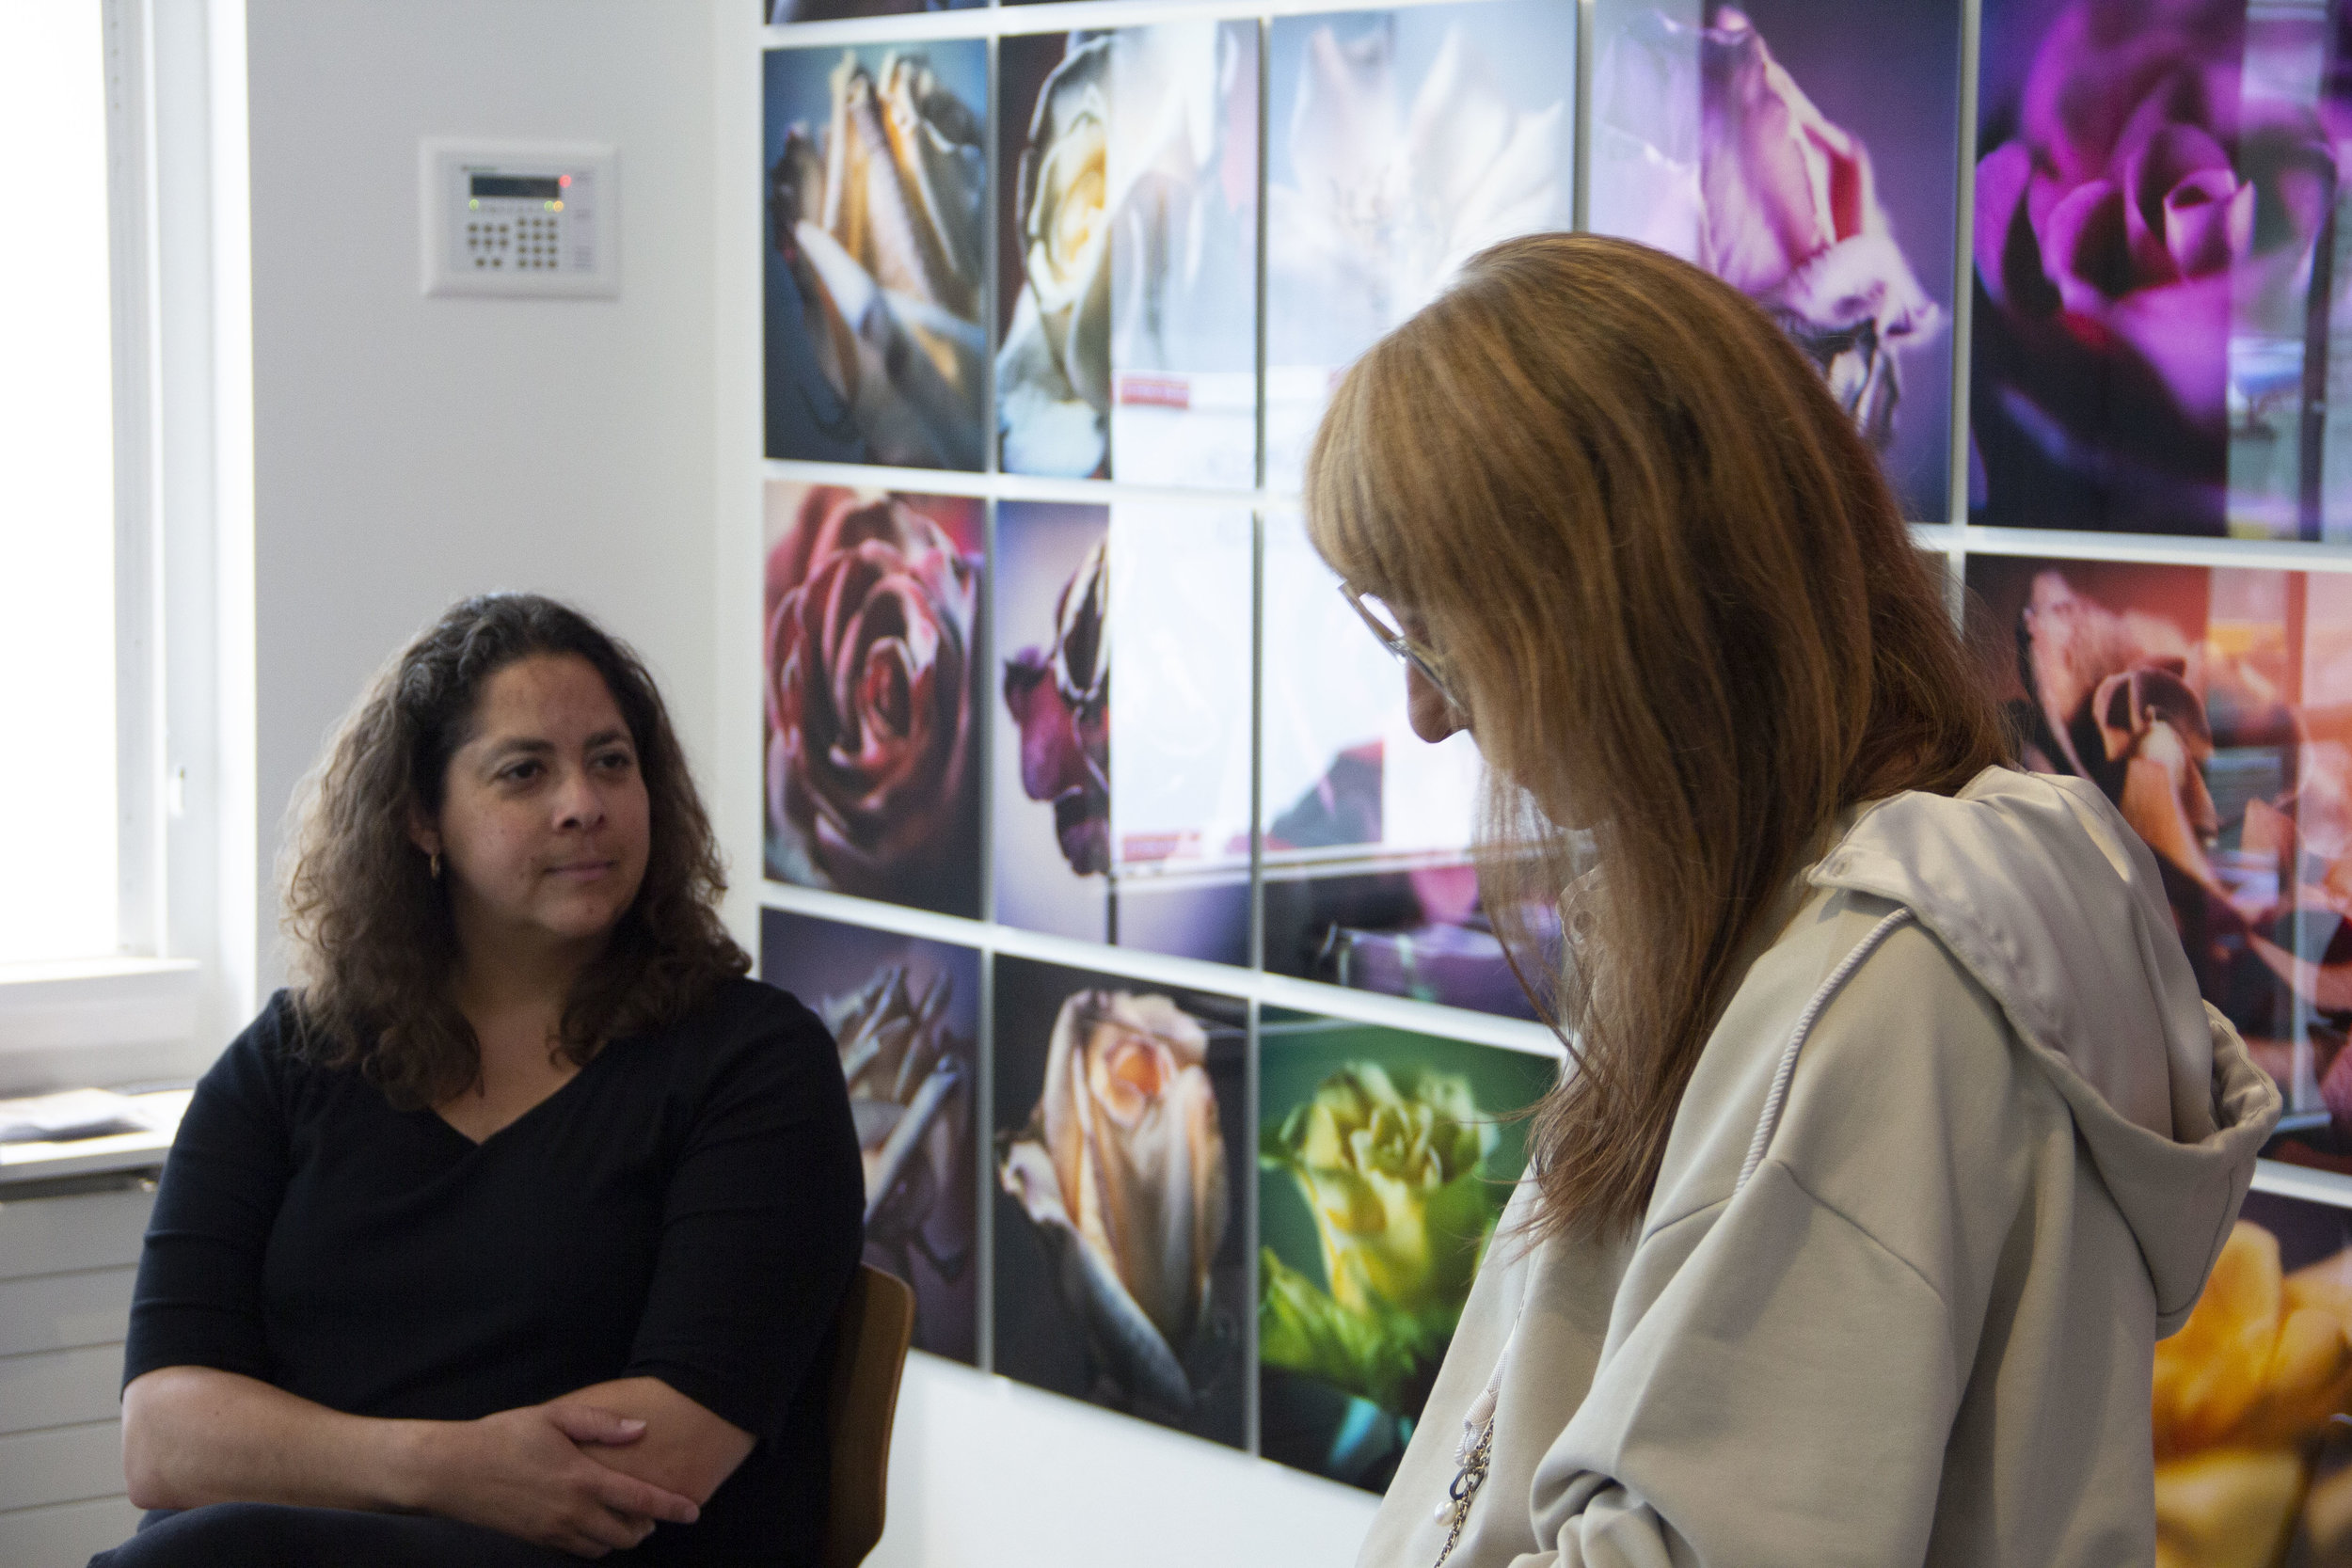 Artist Talk mit Anna Halm Schudel | Bild: Valentina De Pasquale